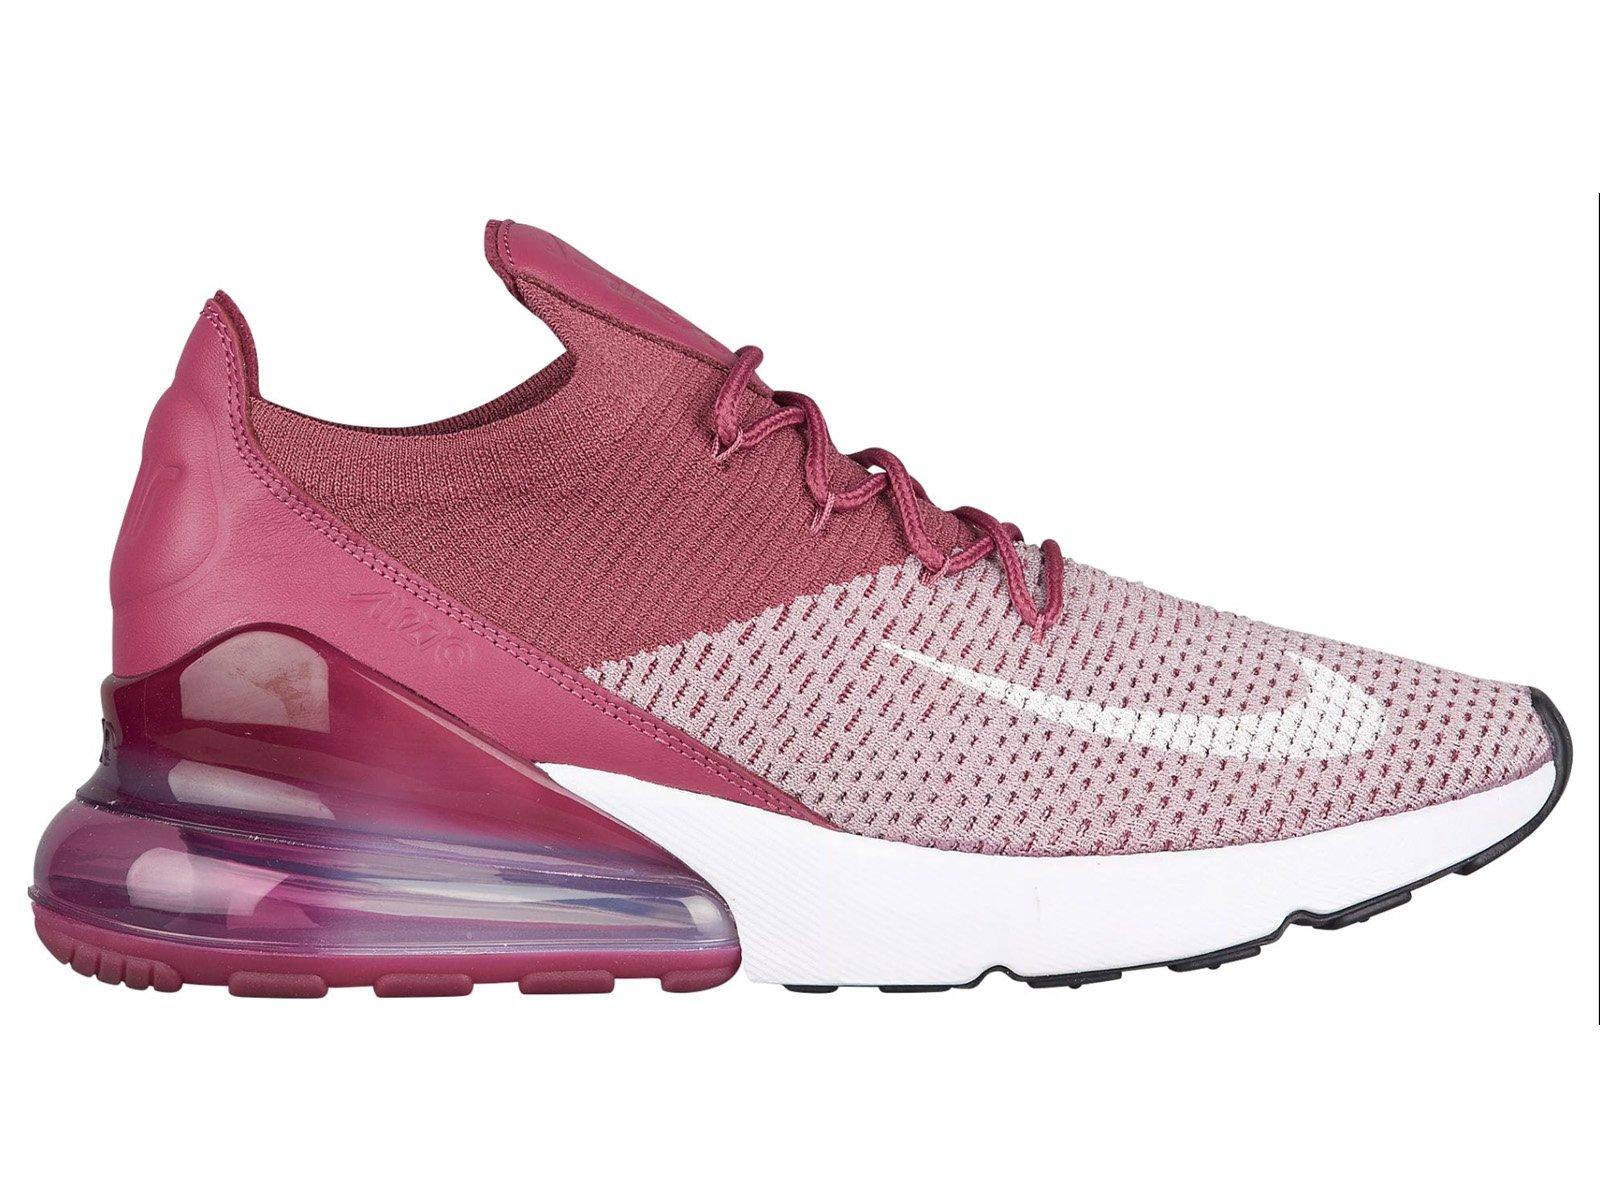 Nike Men's Air Max 270 Running Shoe (10.5 D(M) US, Plum FogWhiteVintage WineTotal Crimson)